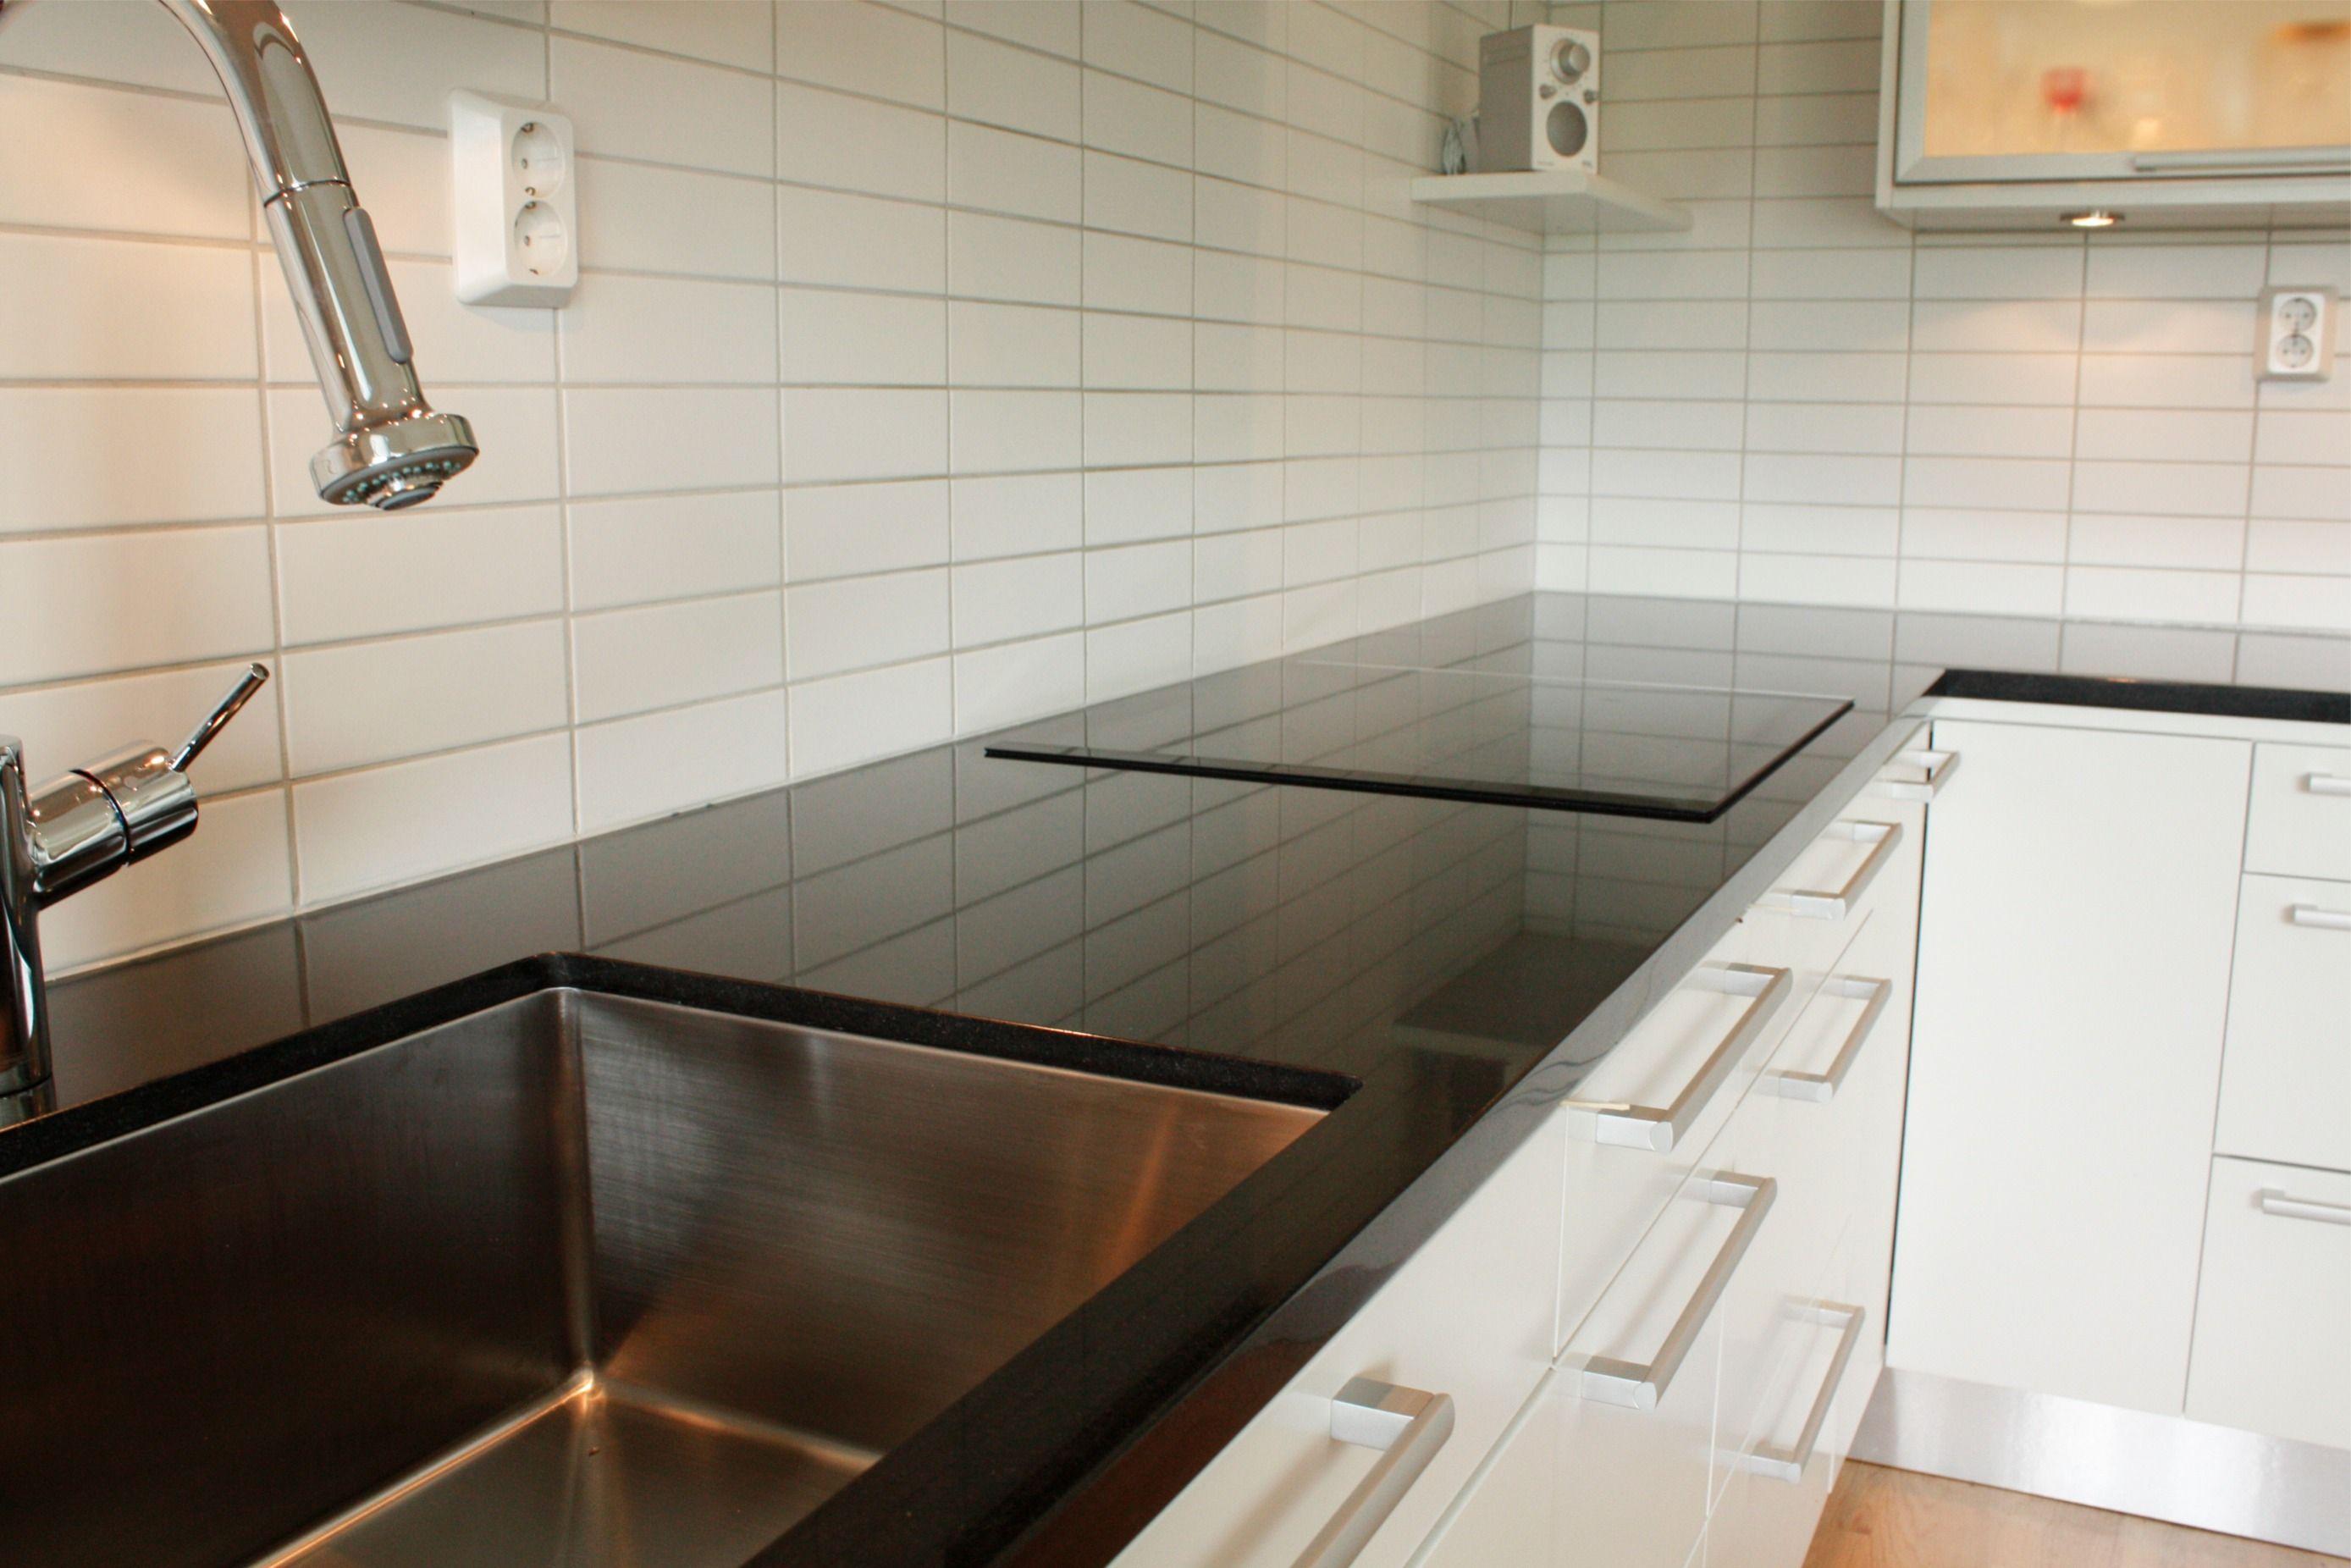 Elegant Recouvrir Plan De Travail Cuisine Plan De Travail Cuisine Plan De Travail Home Staging Cuisine